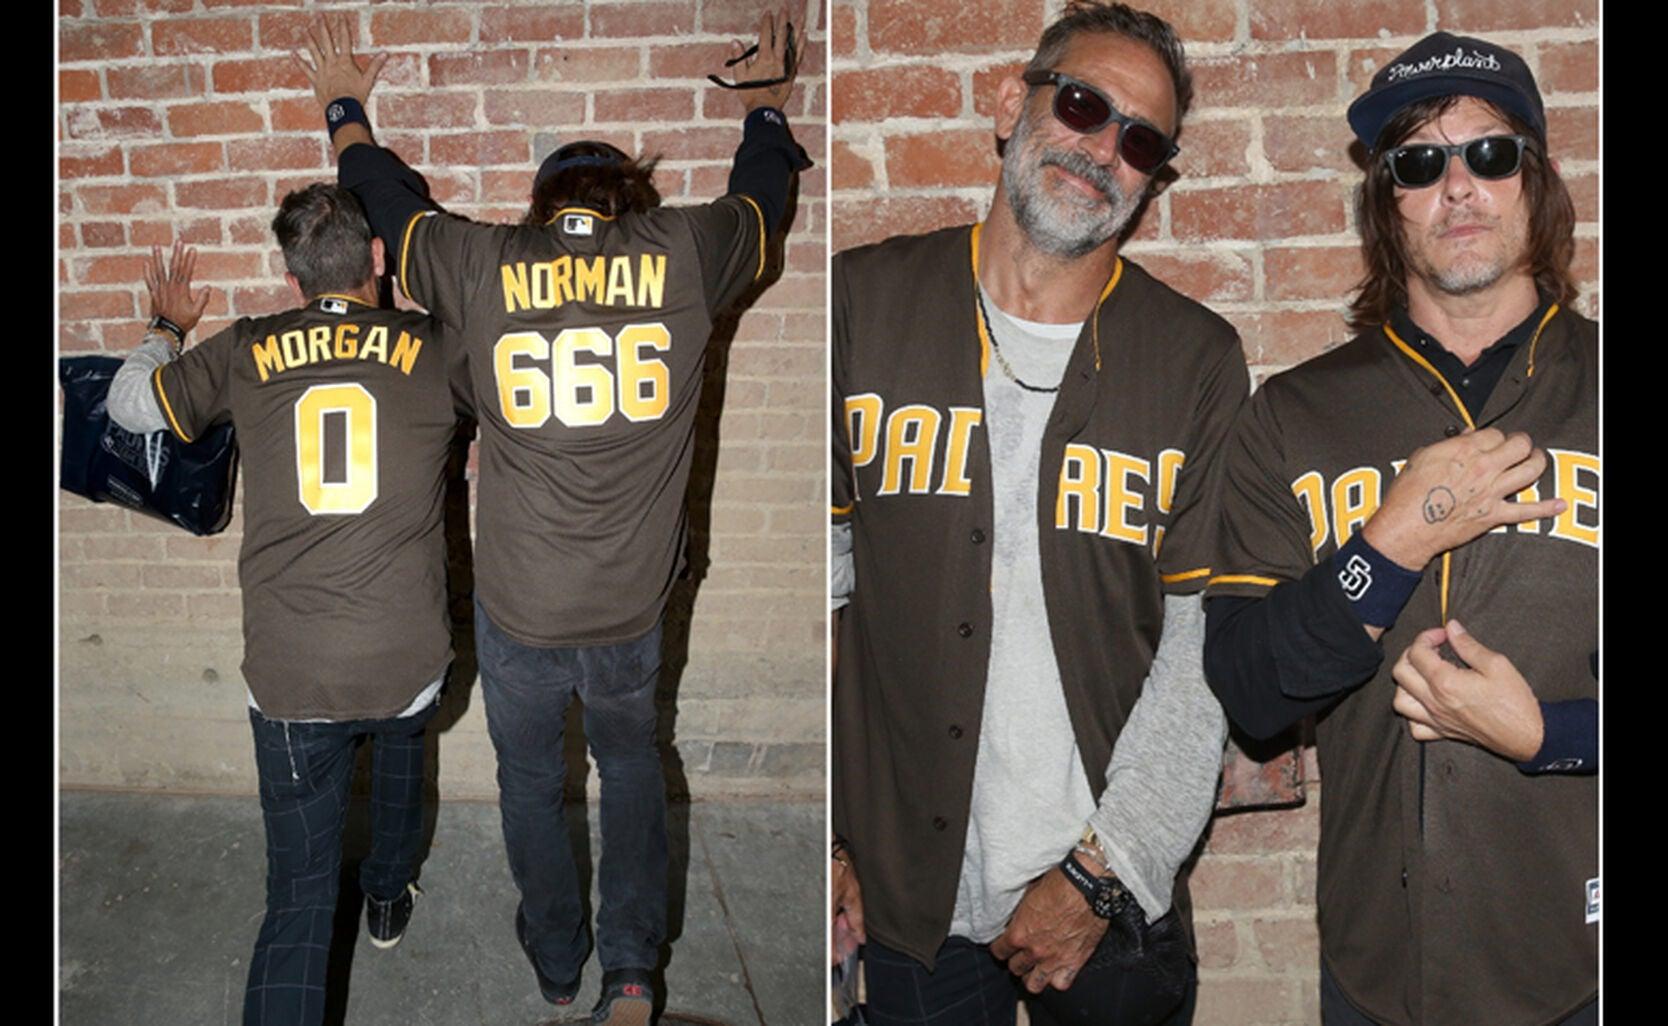 Actors Norman Reedus and Jeffrey Dean Morgan